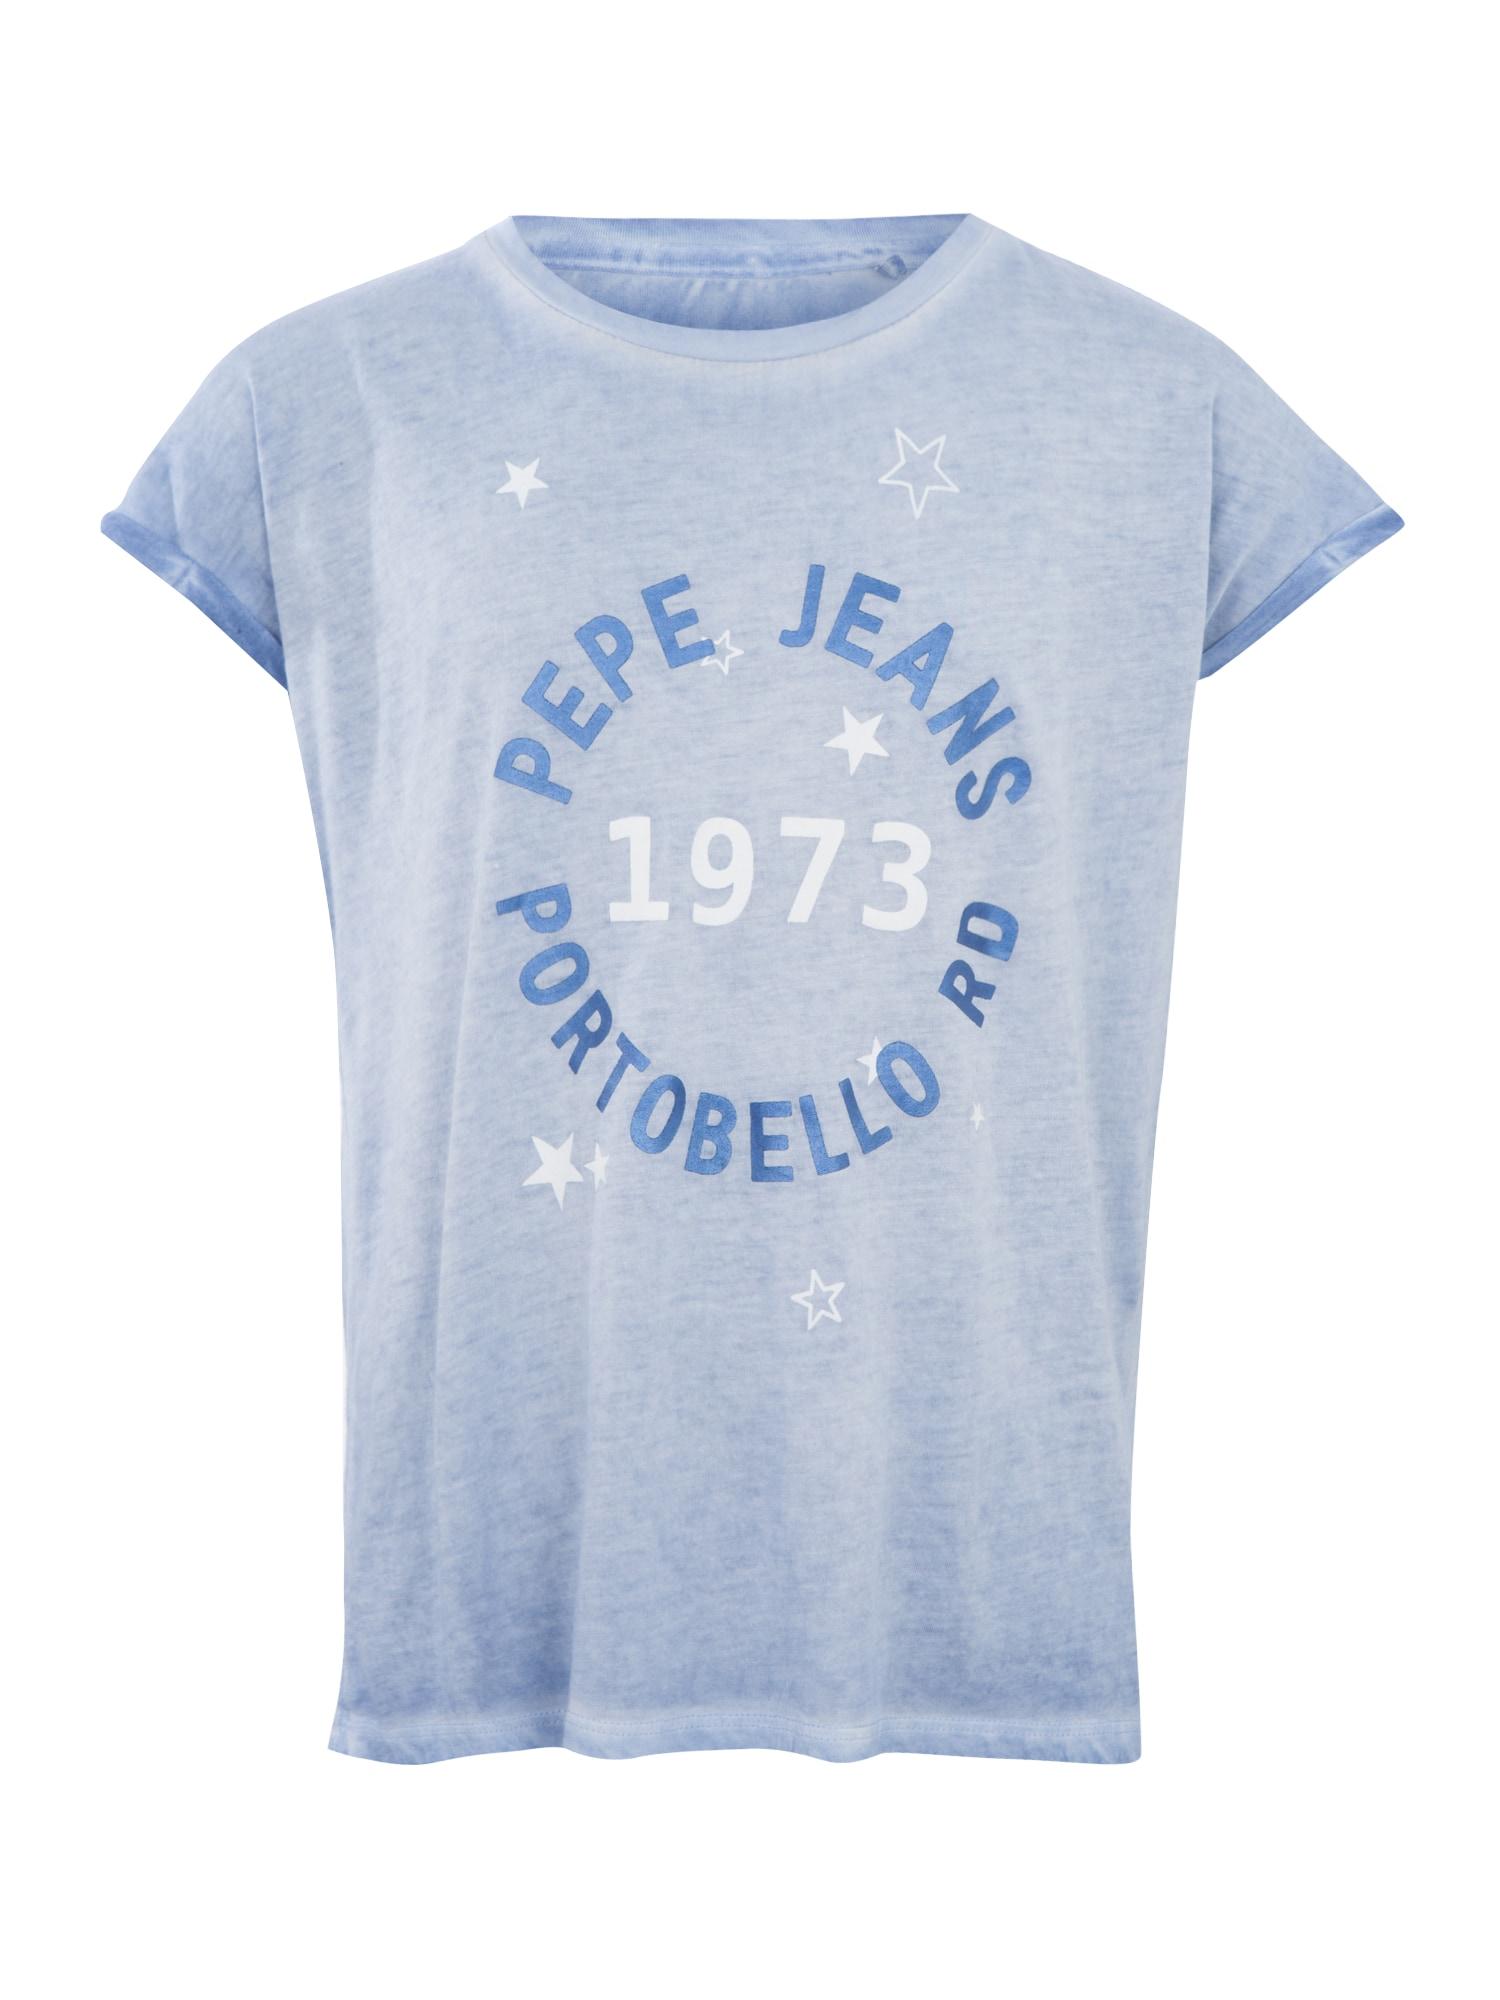 Pepe Jeans Meisjes Top NORA blauw